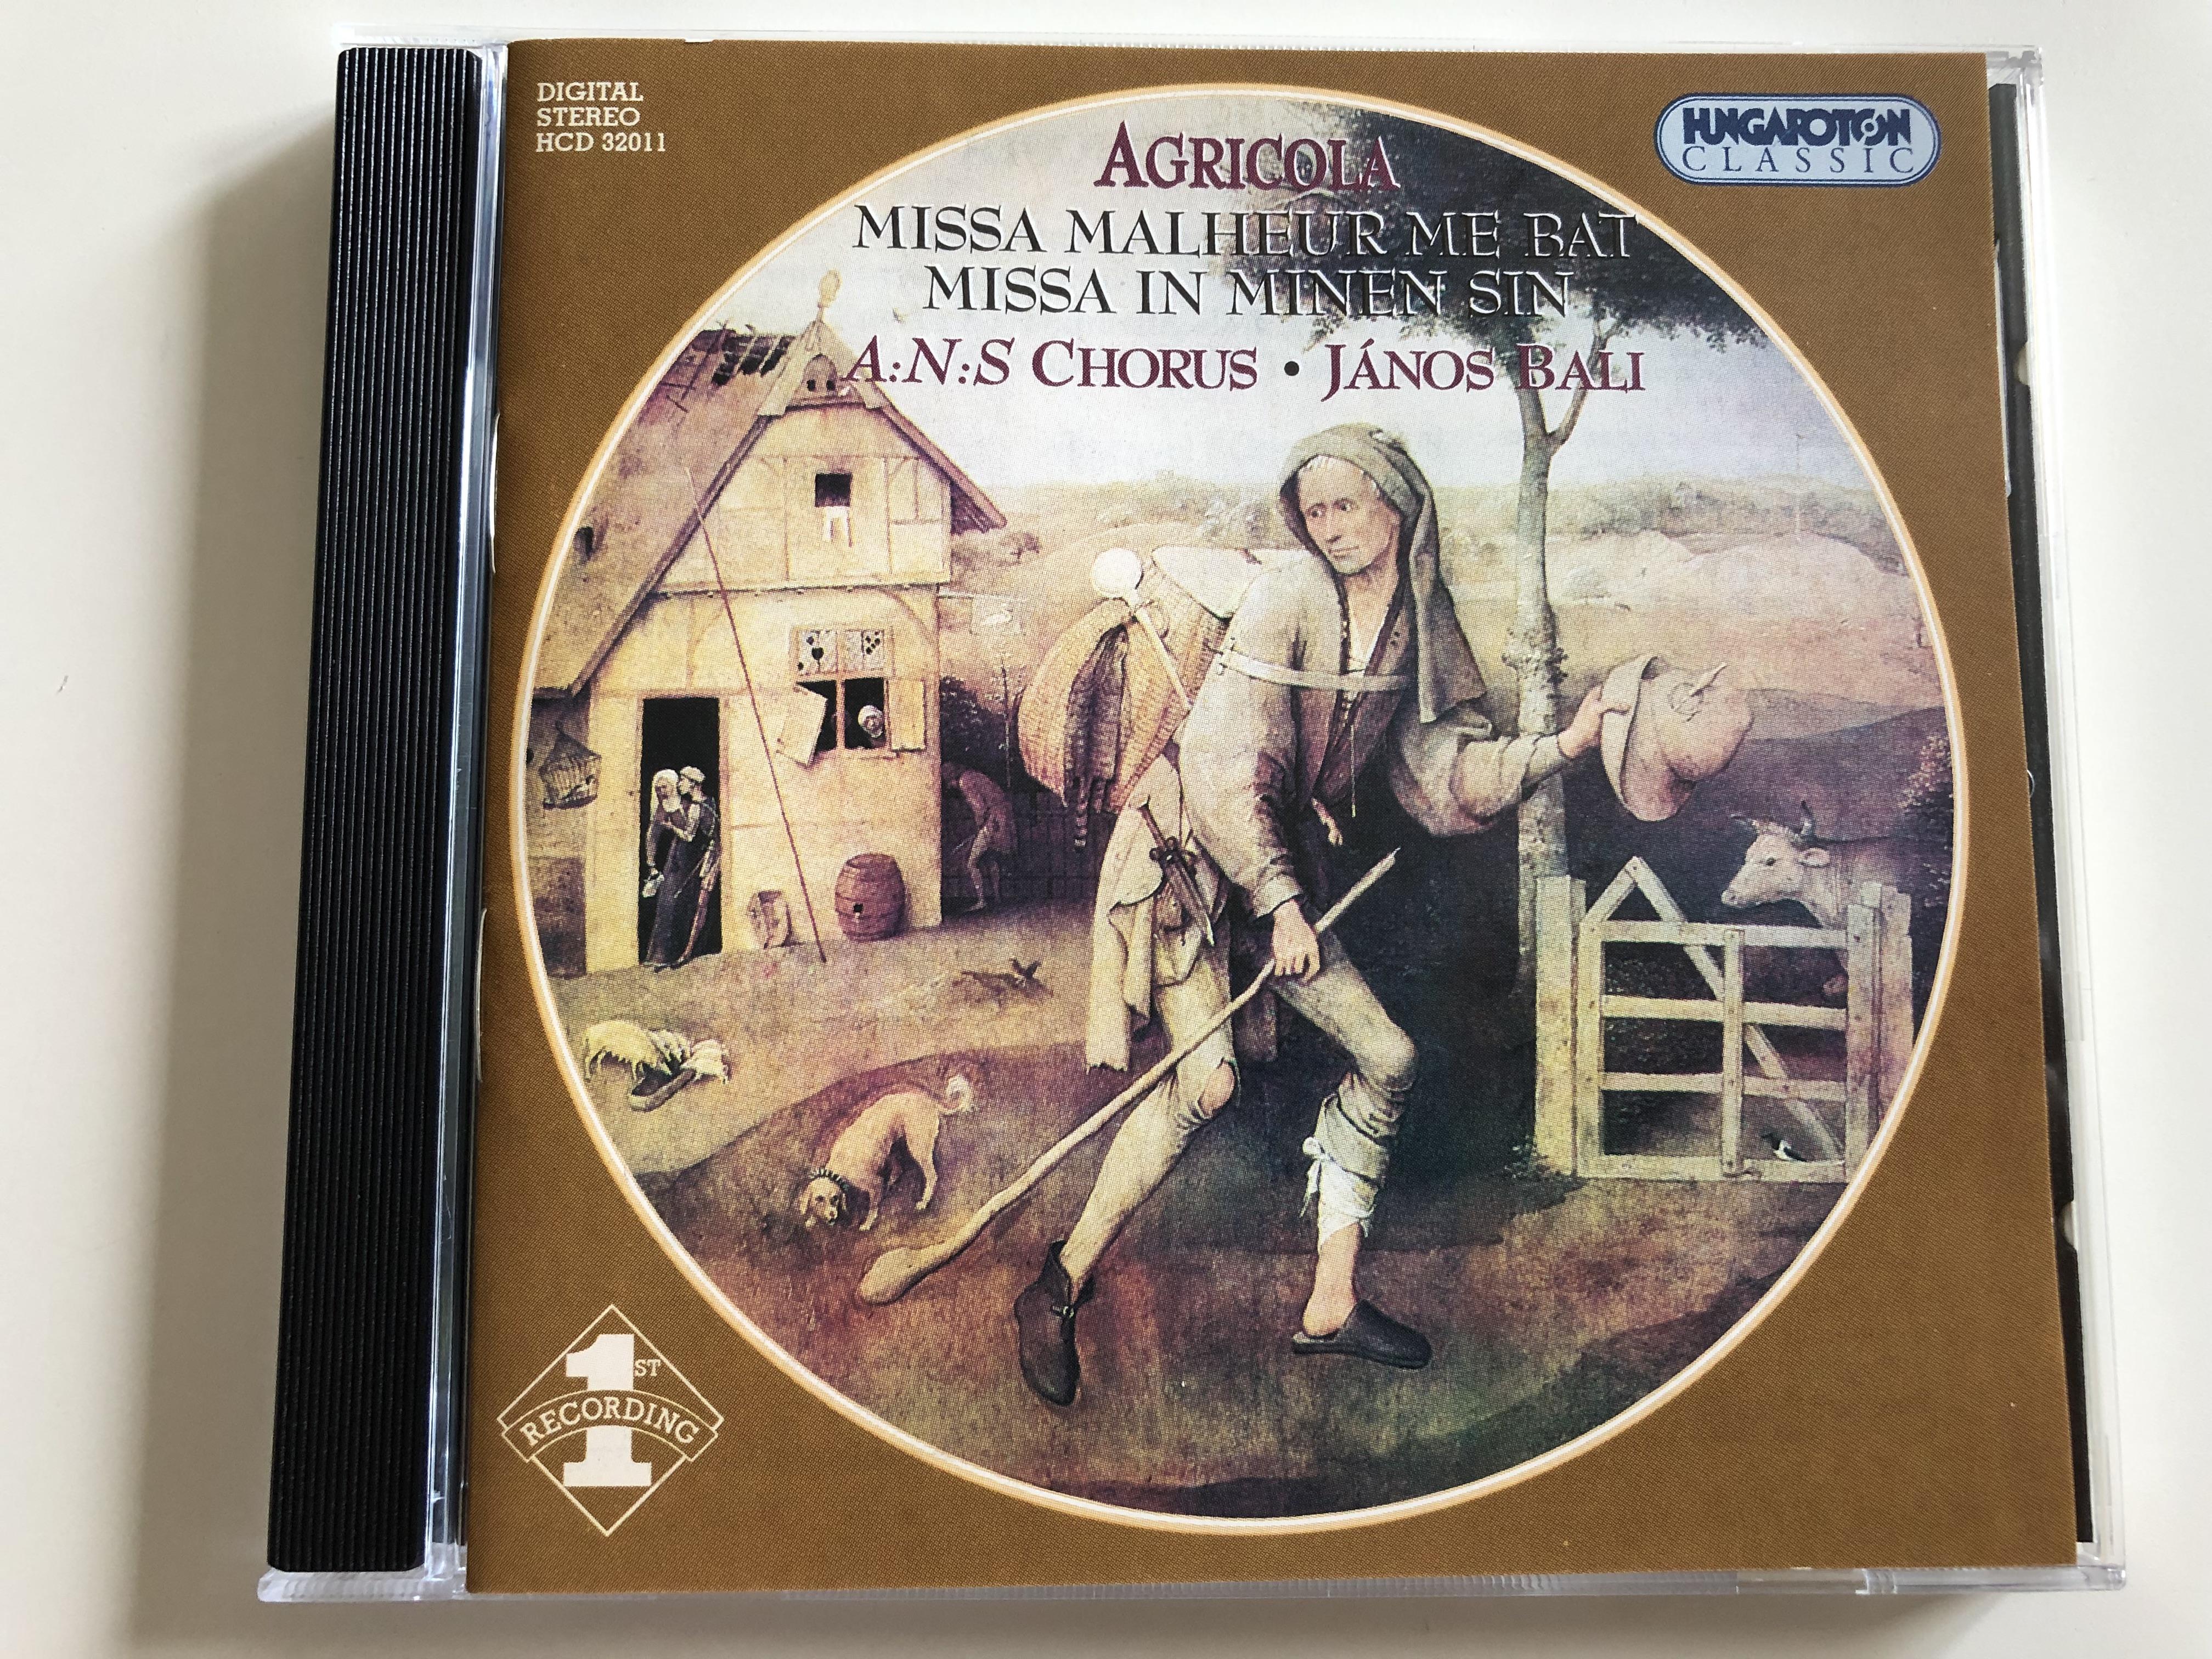 agricola-missa-malheur-me-bat-missa-in-minen-sin-ans-chorus-j-nos-bali-hungaroton-classic-audio-cd-2001-hcd-32011-1-.jpg